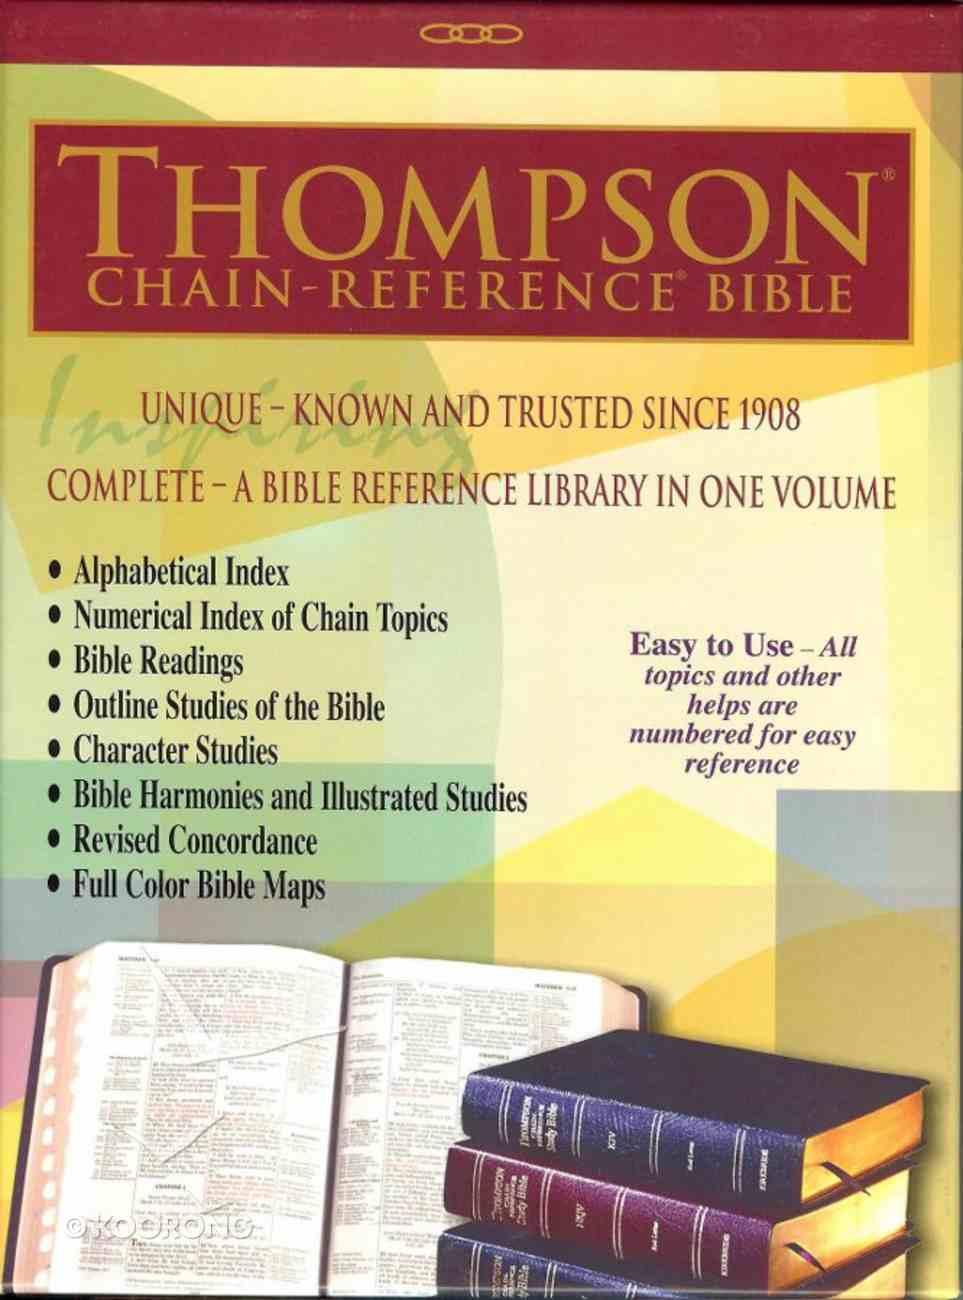 KJV Thompson Chain-Reference Bible Black Genuine Leather